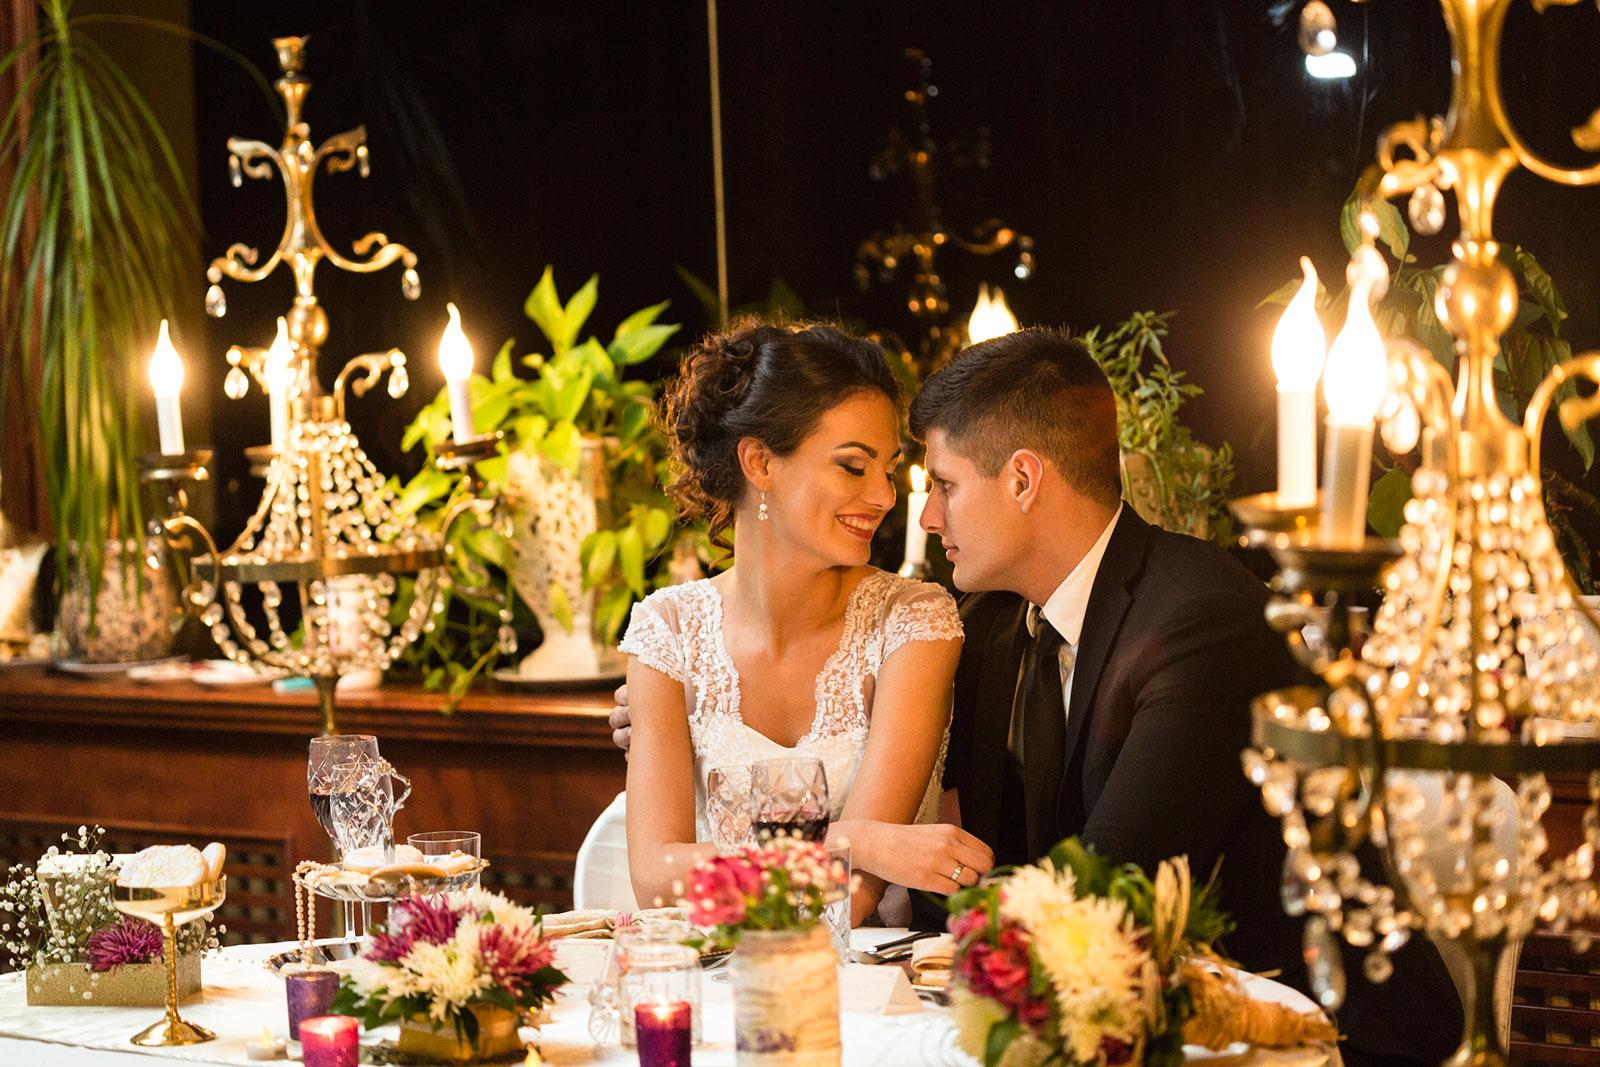 Extravagant Wedding Ideas | LoveToKnow